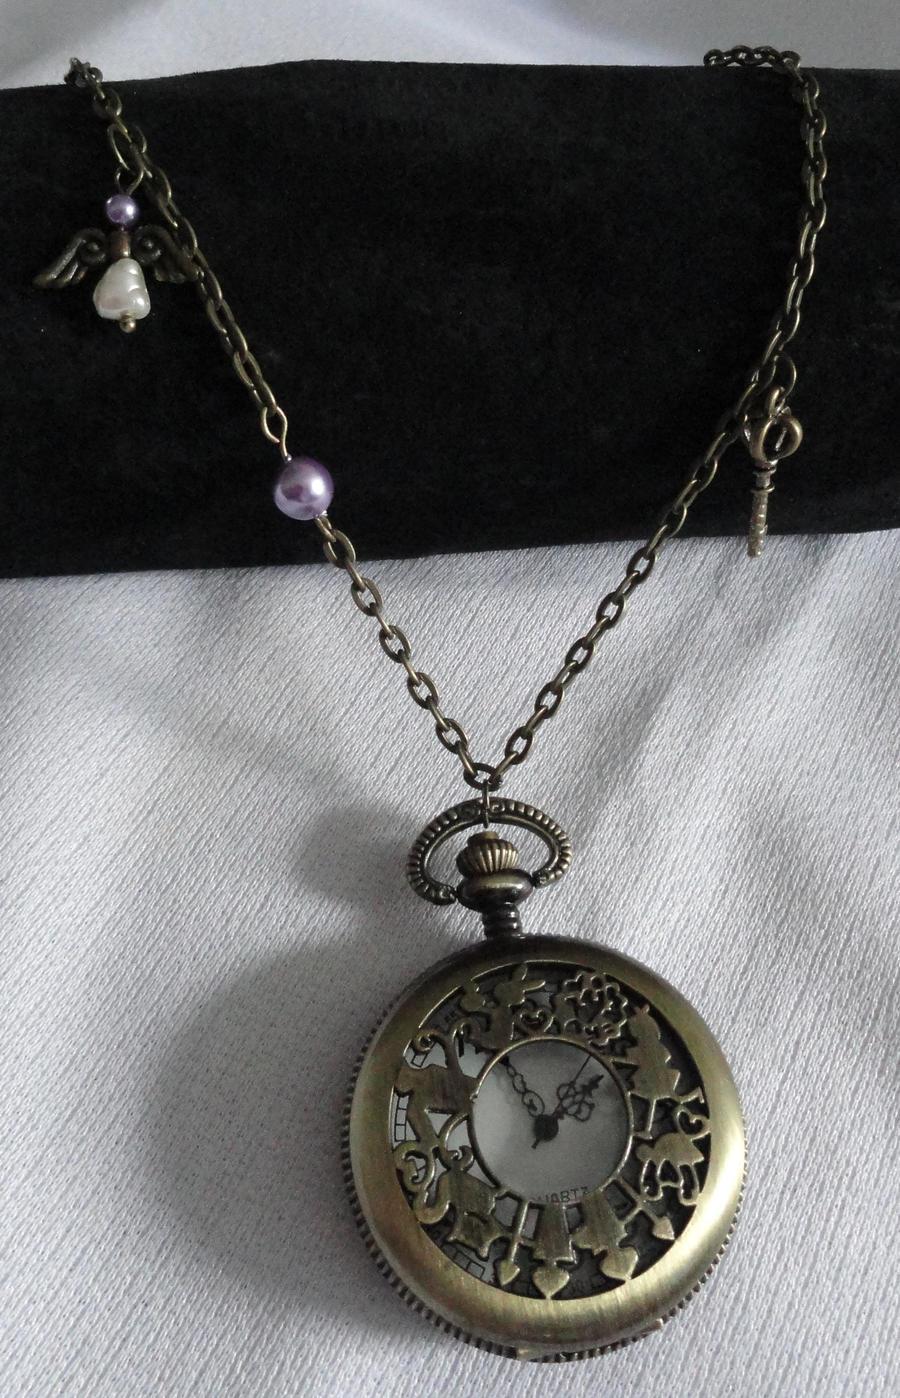 Steampunk Alice in Wonderland Pocketwatch Necklace by Sparkling-Sky